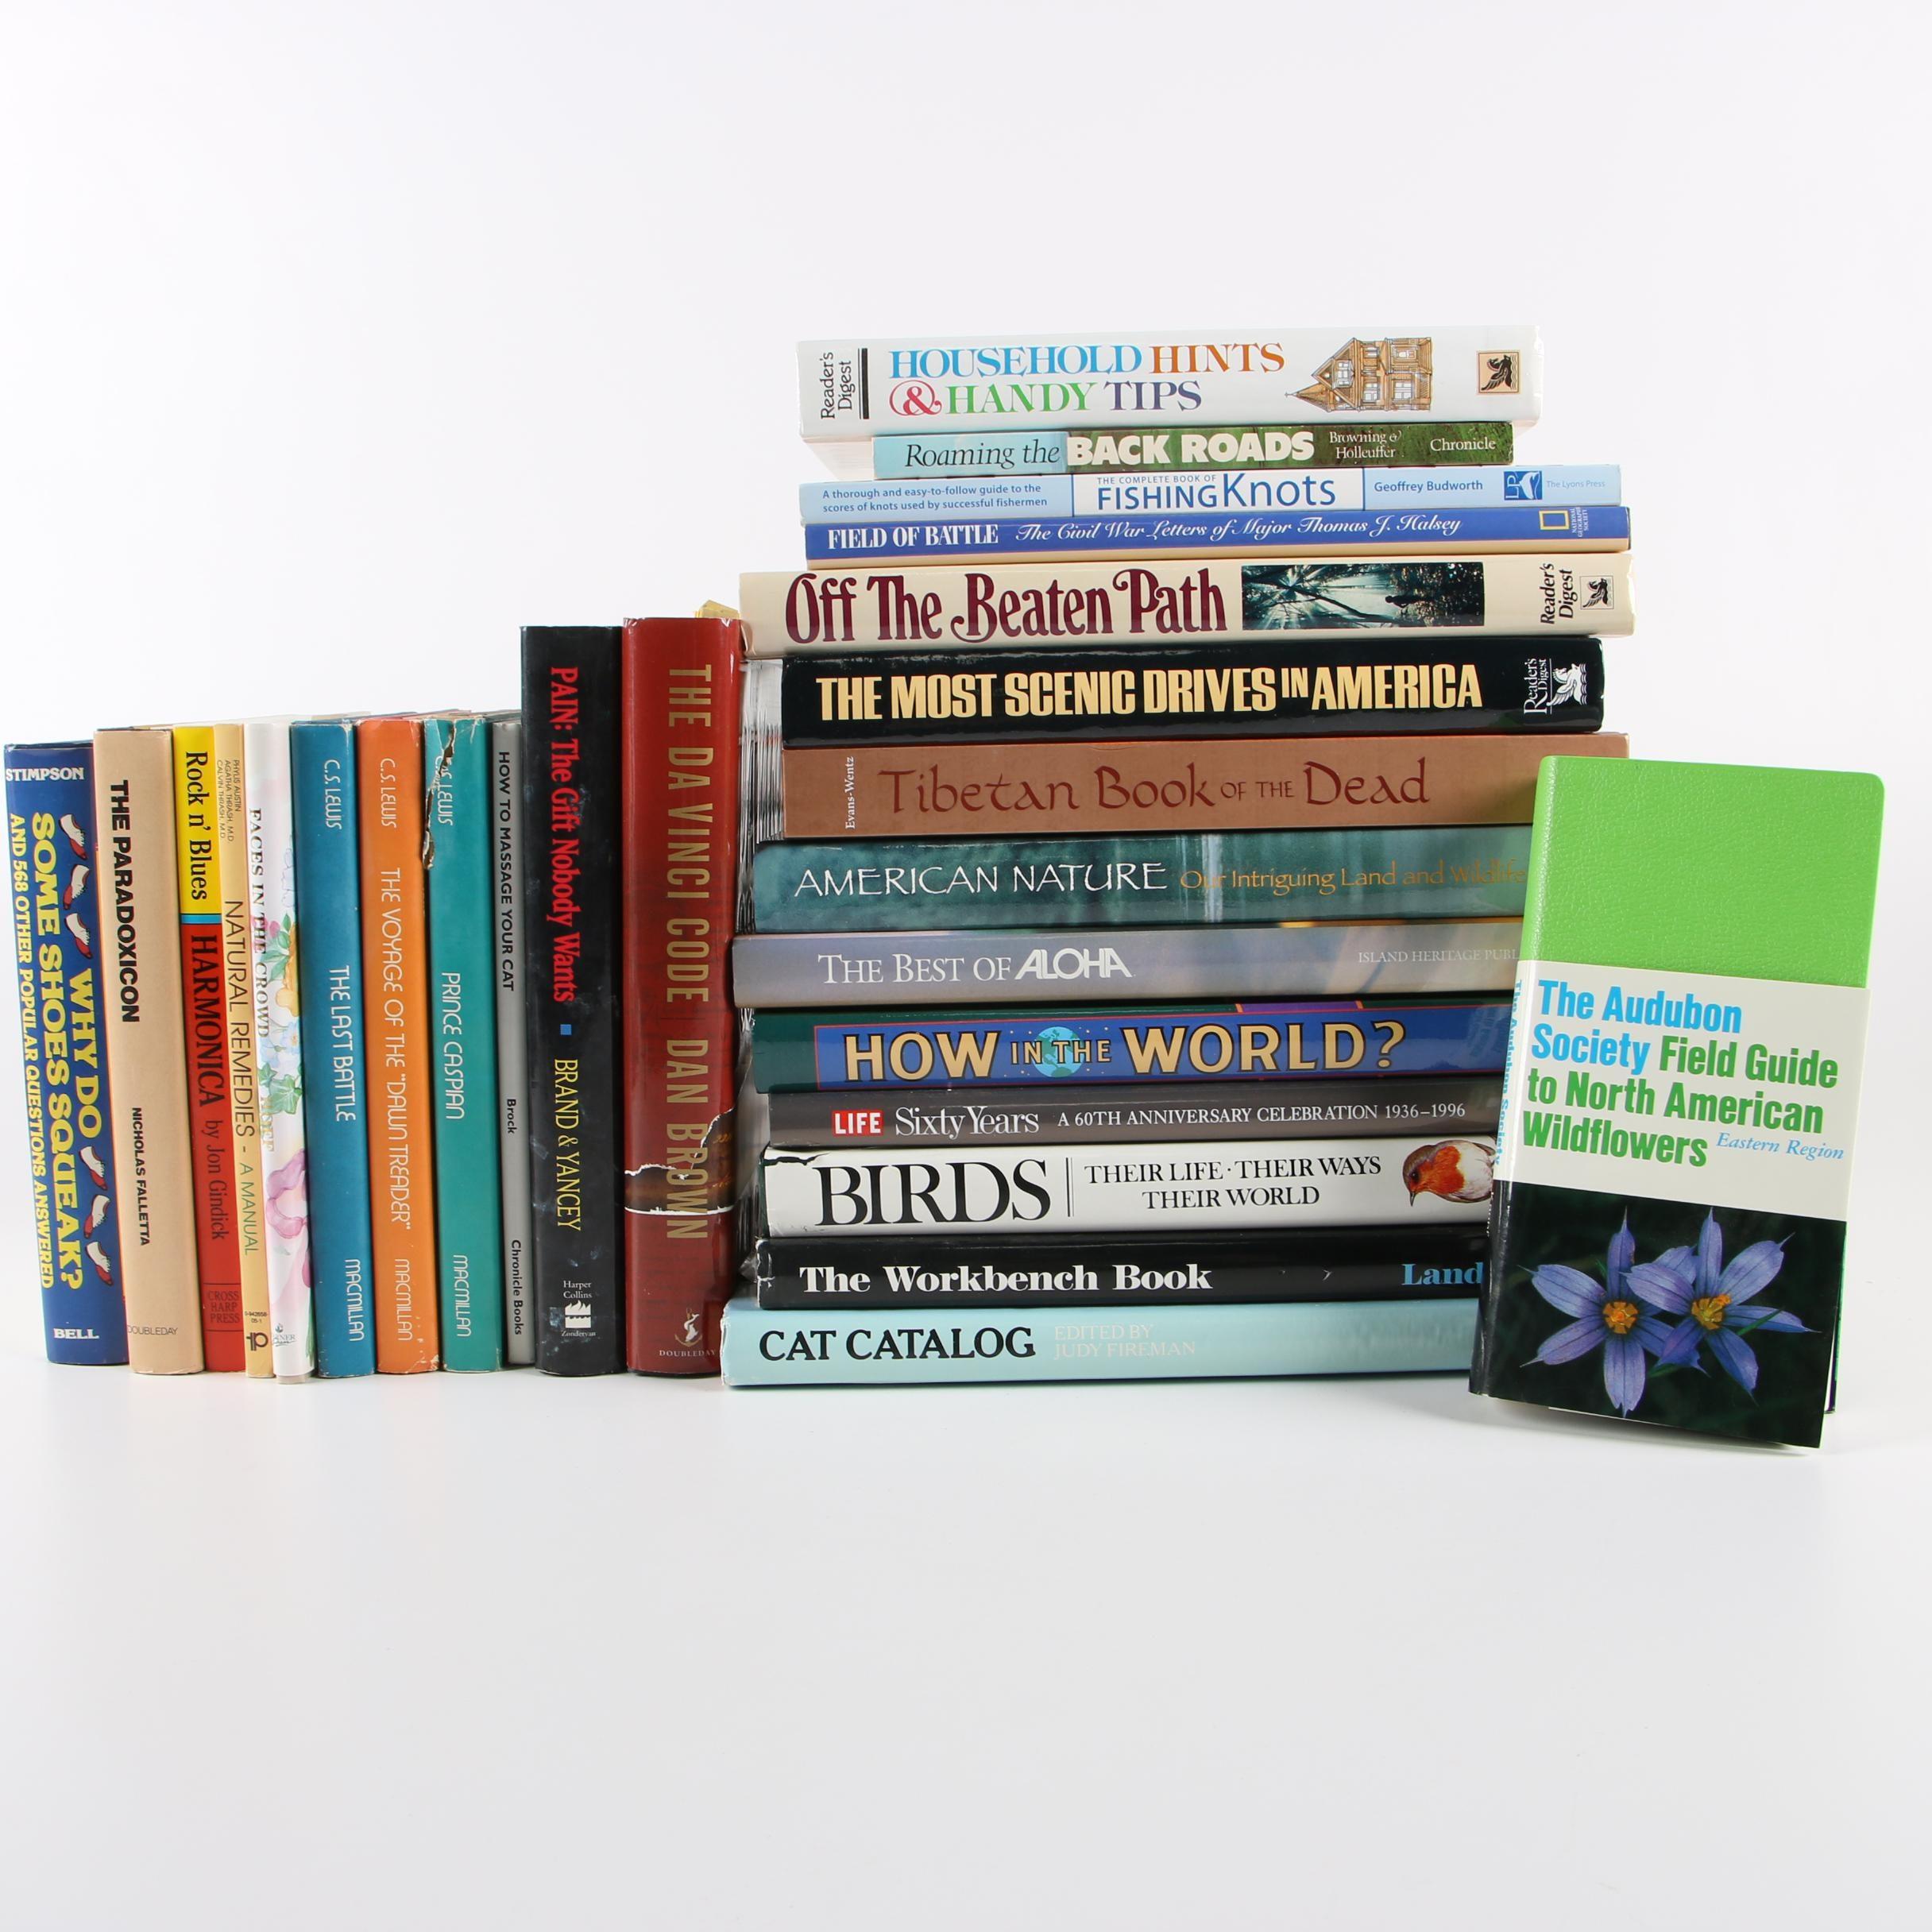 Nonfiction and Fiction including C. S. Lewis